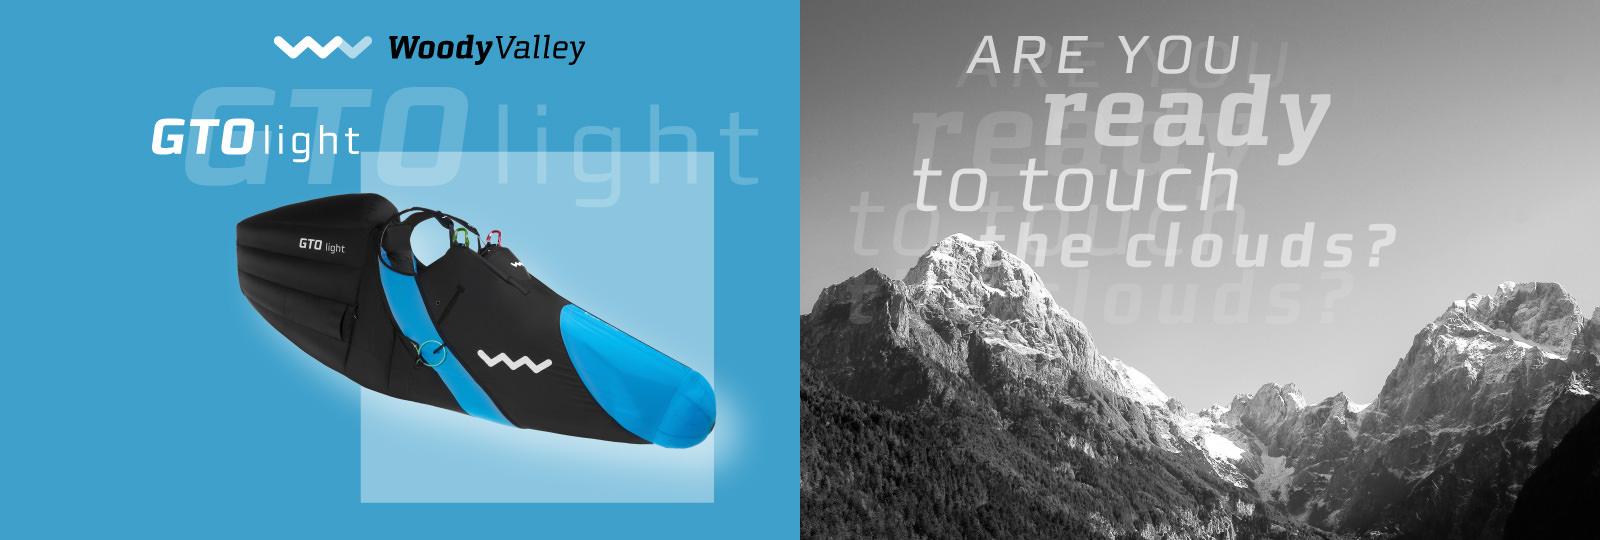 Woody Valley GTO-light